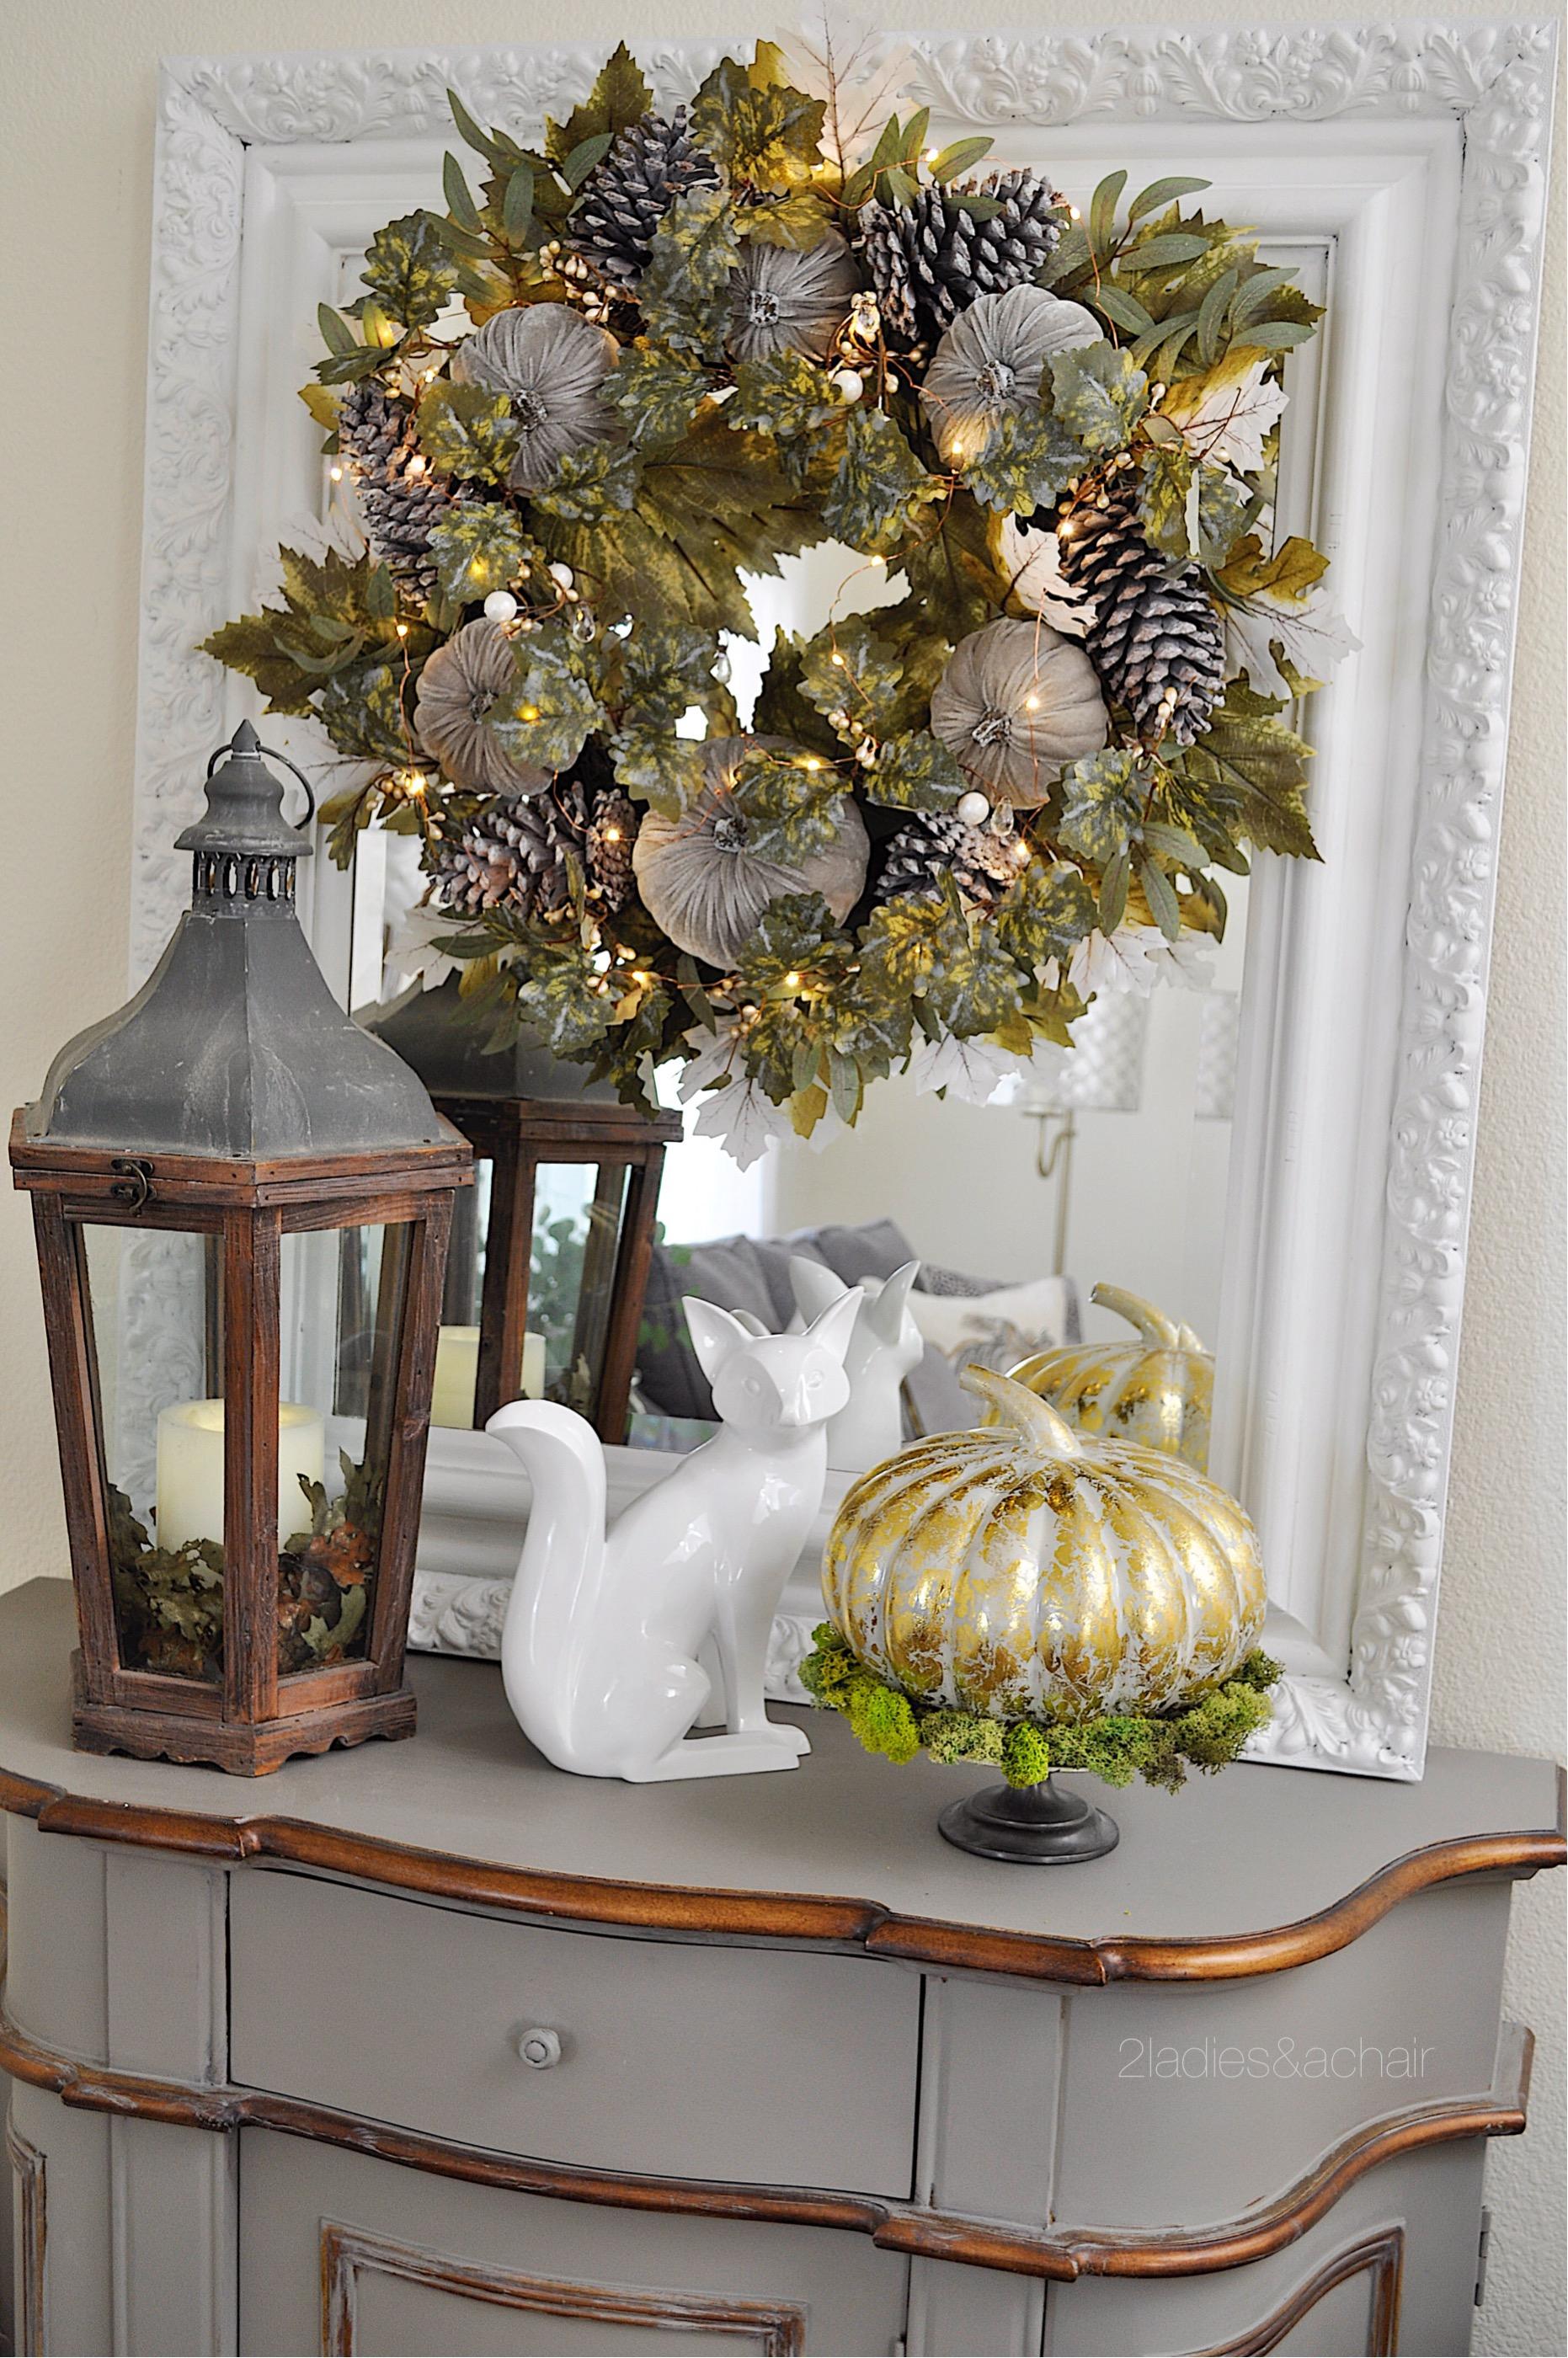 decorate fall entryway IMG_7985.JPG